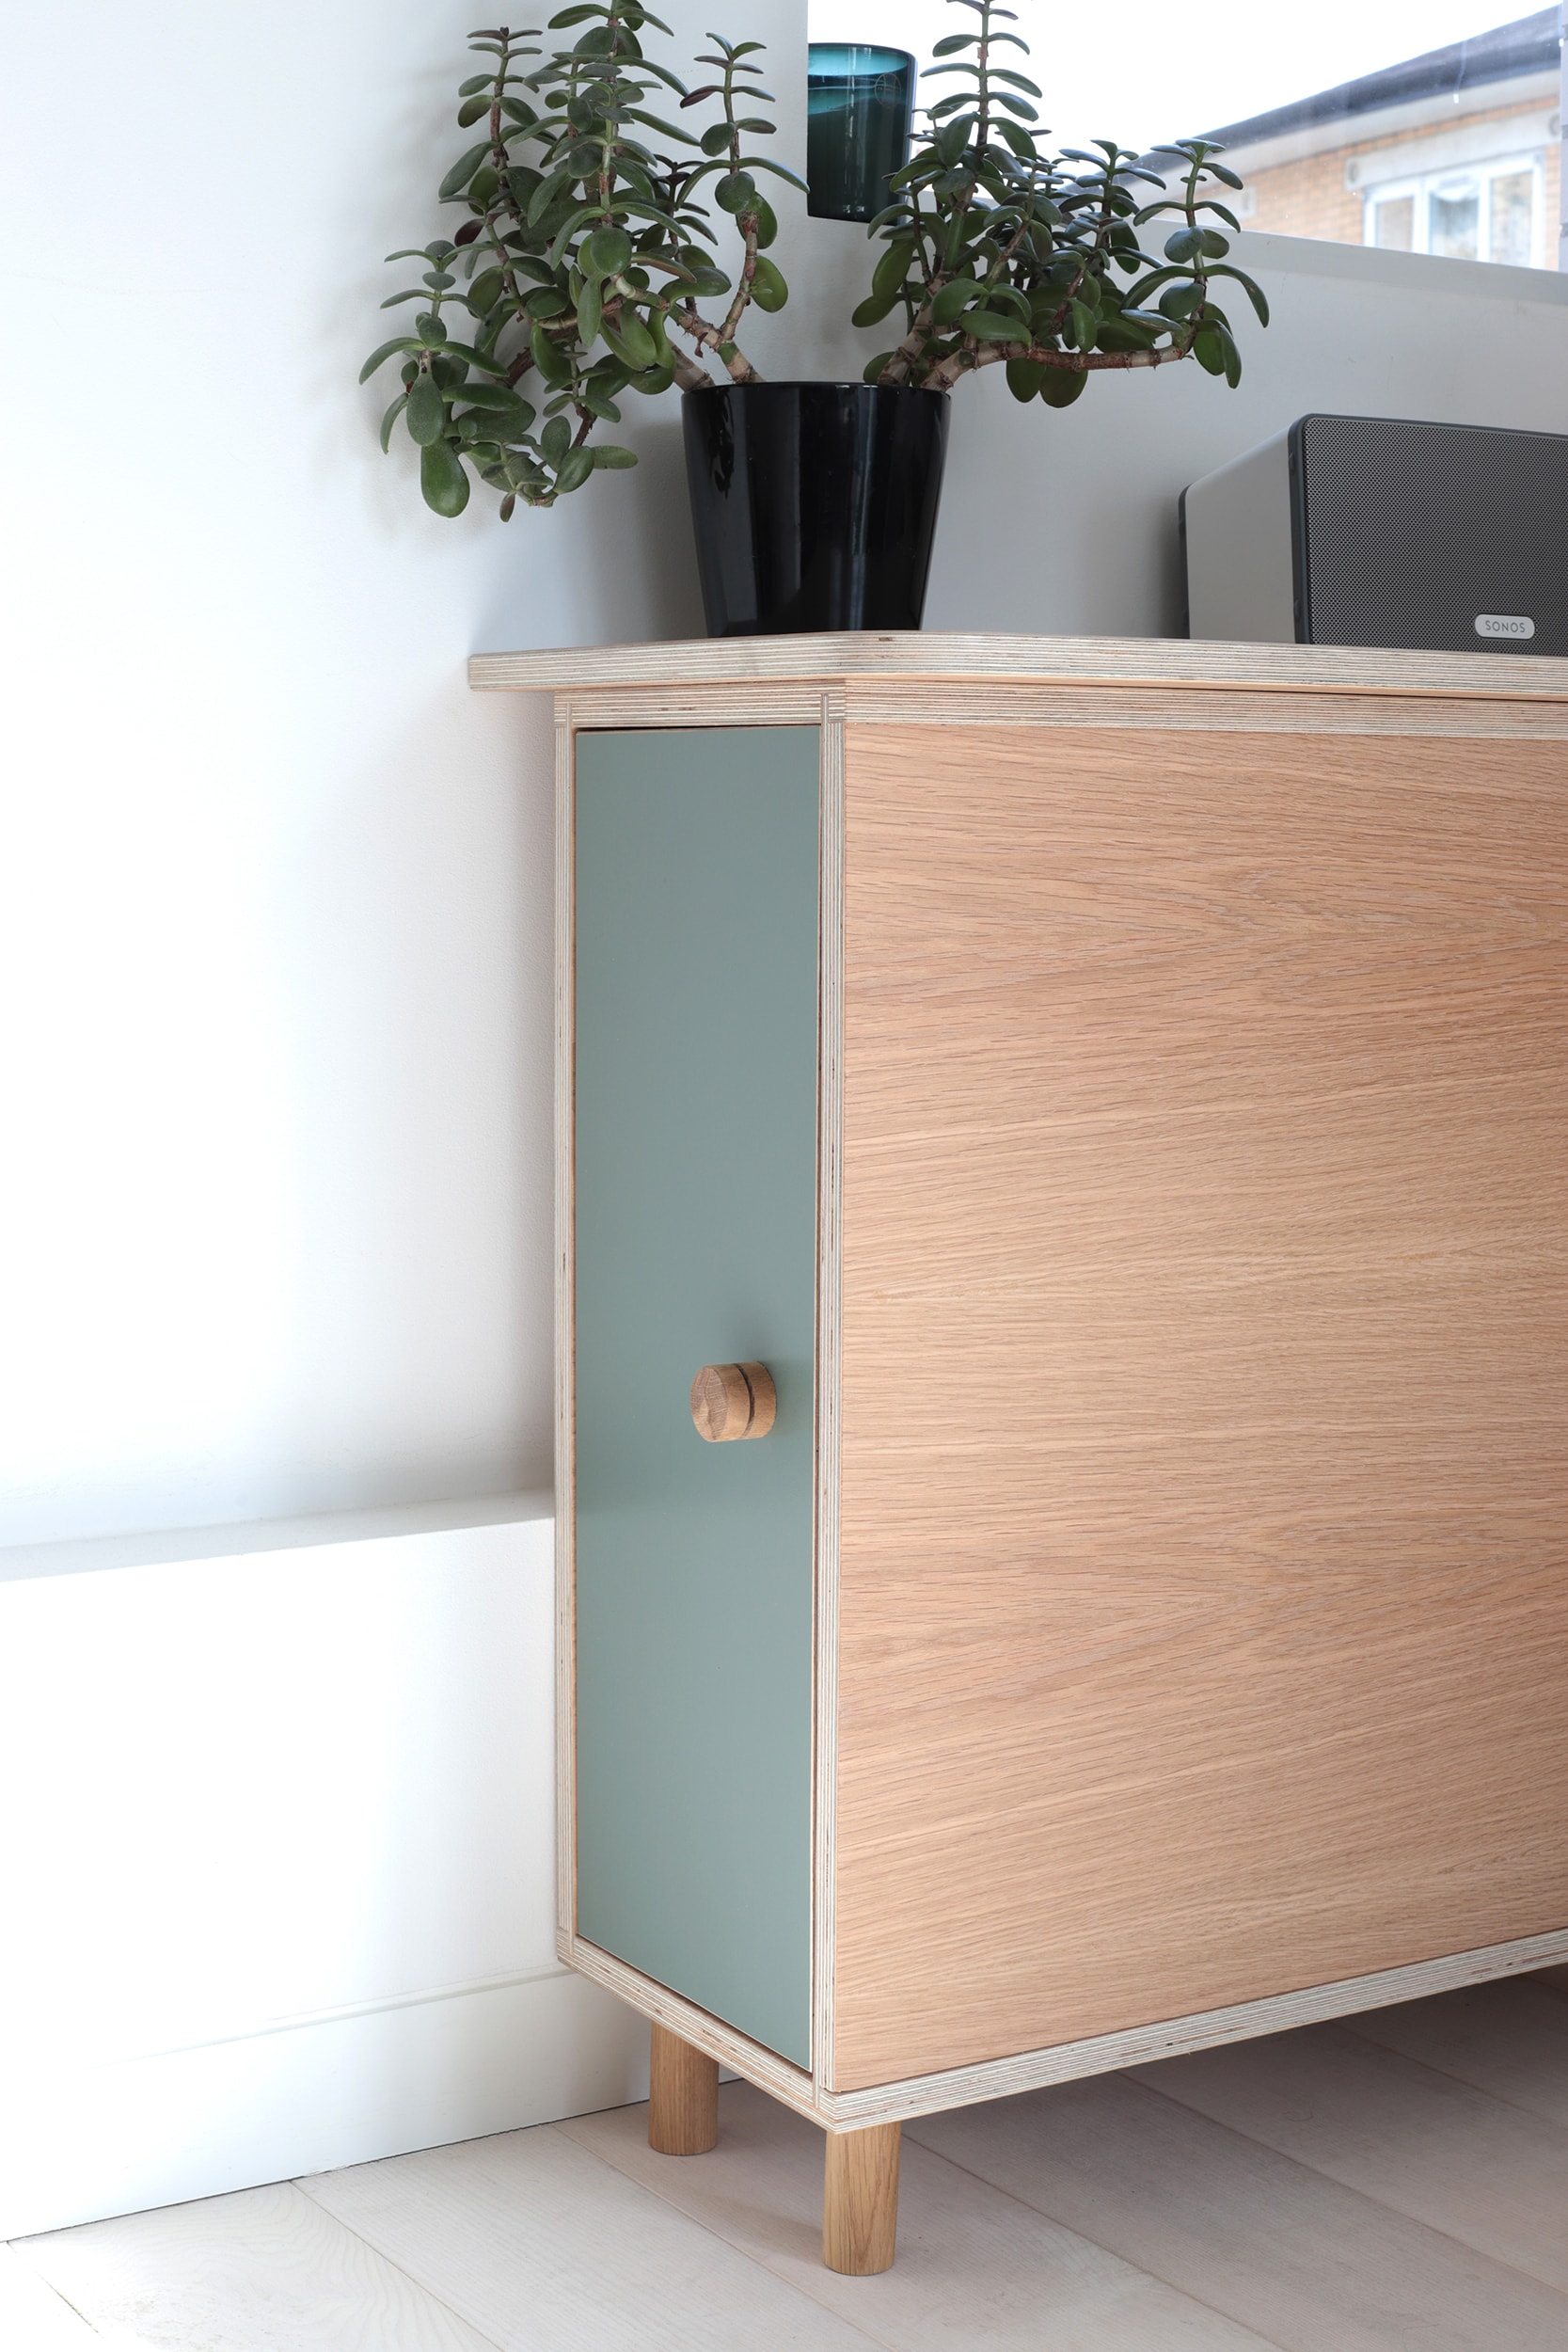 Order 428 - Jessica Barnes - Desk 5 WEB-min.jpg